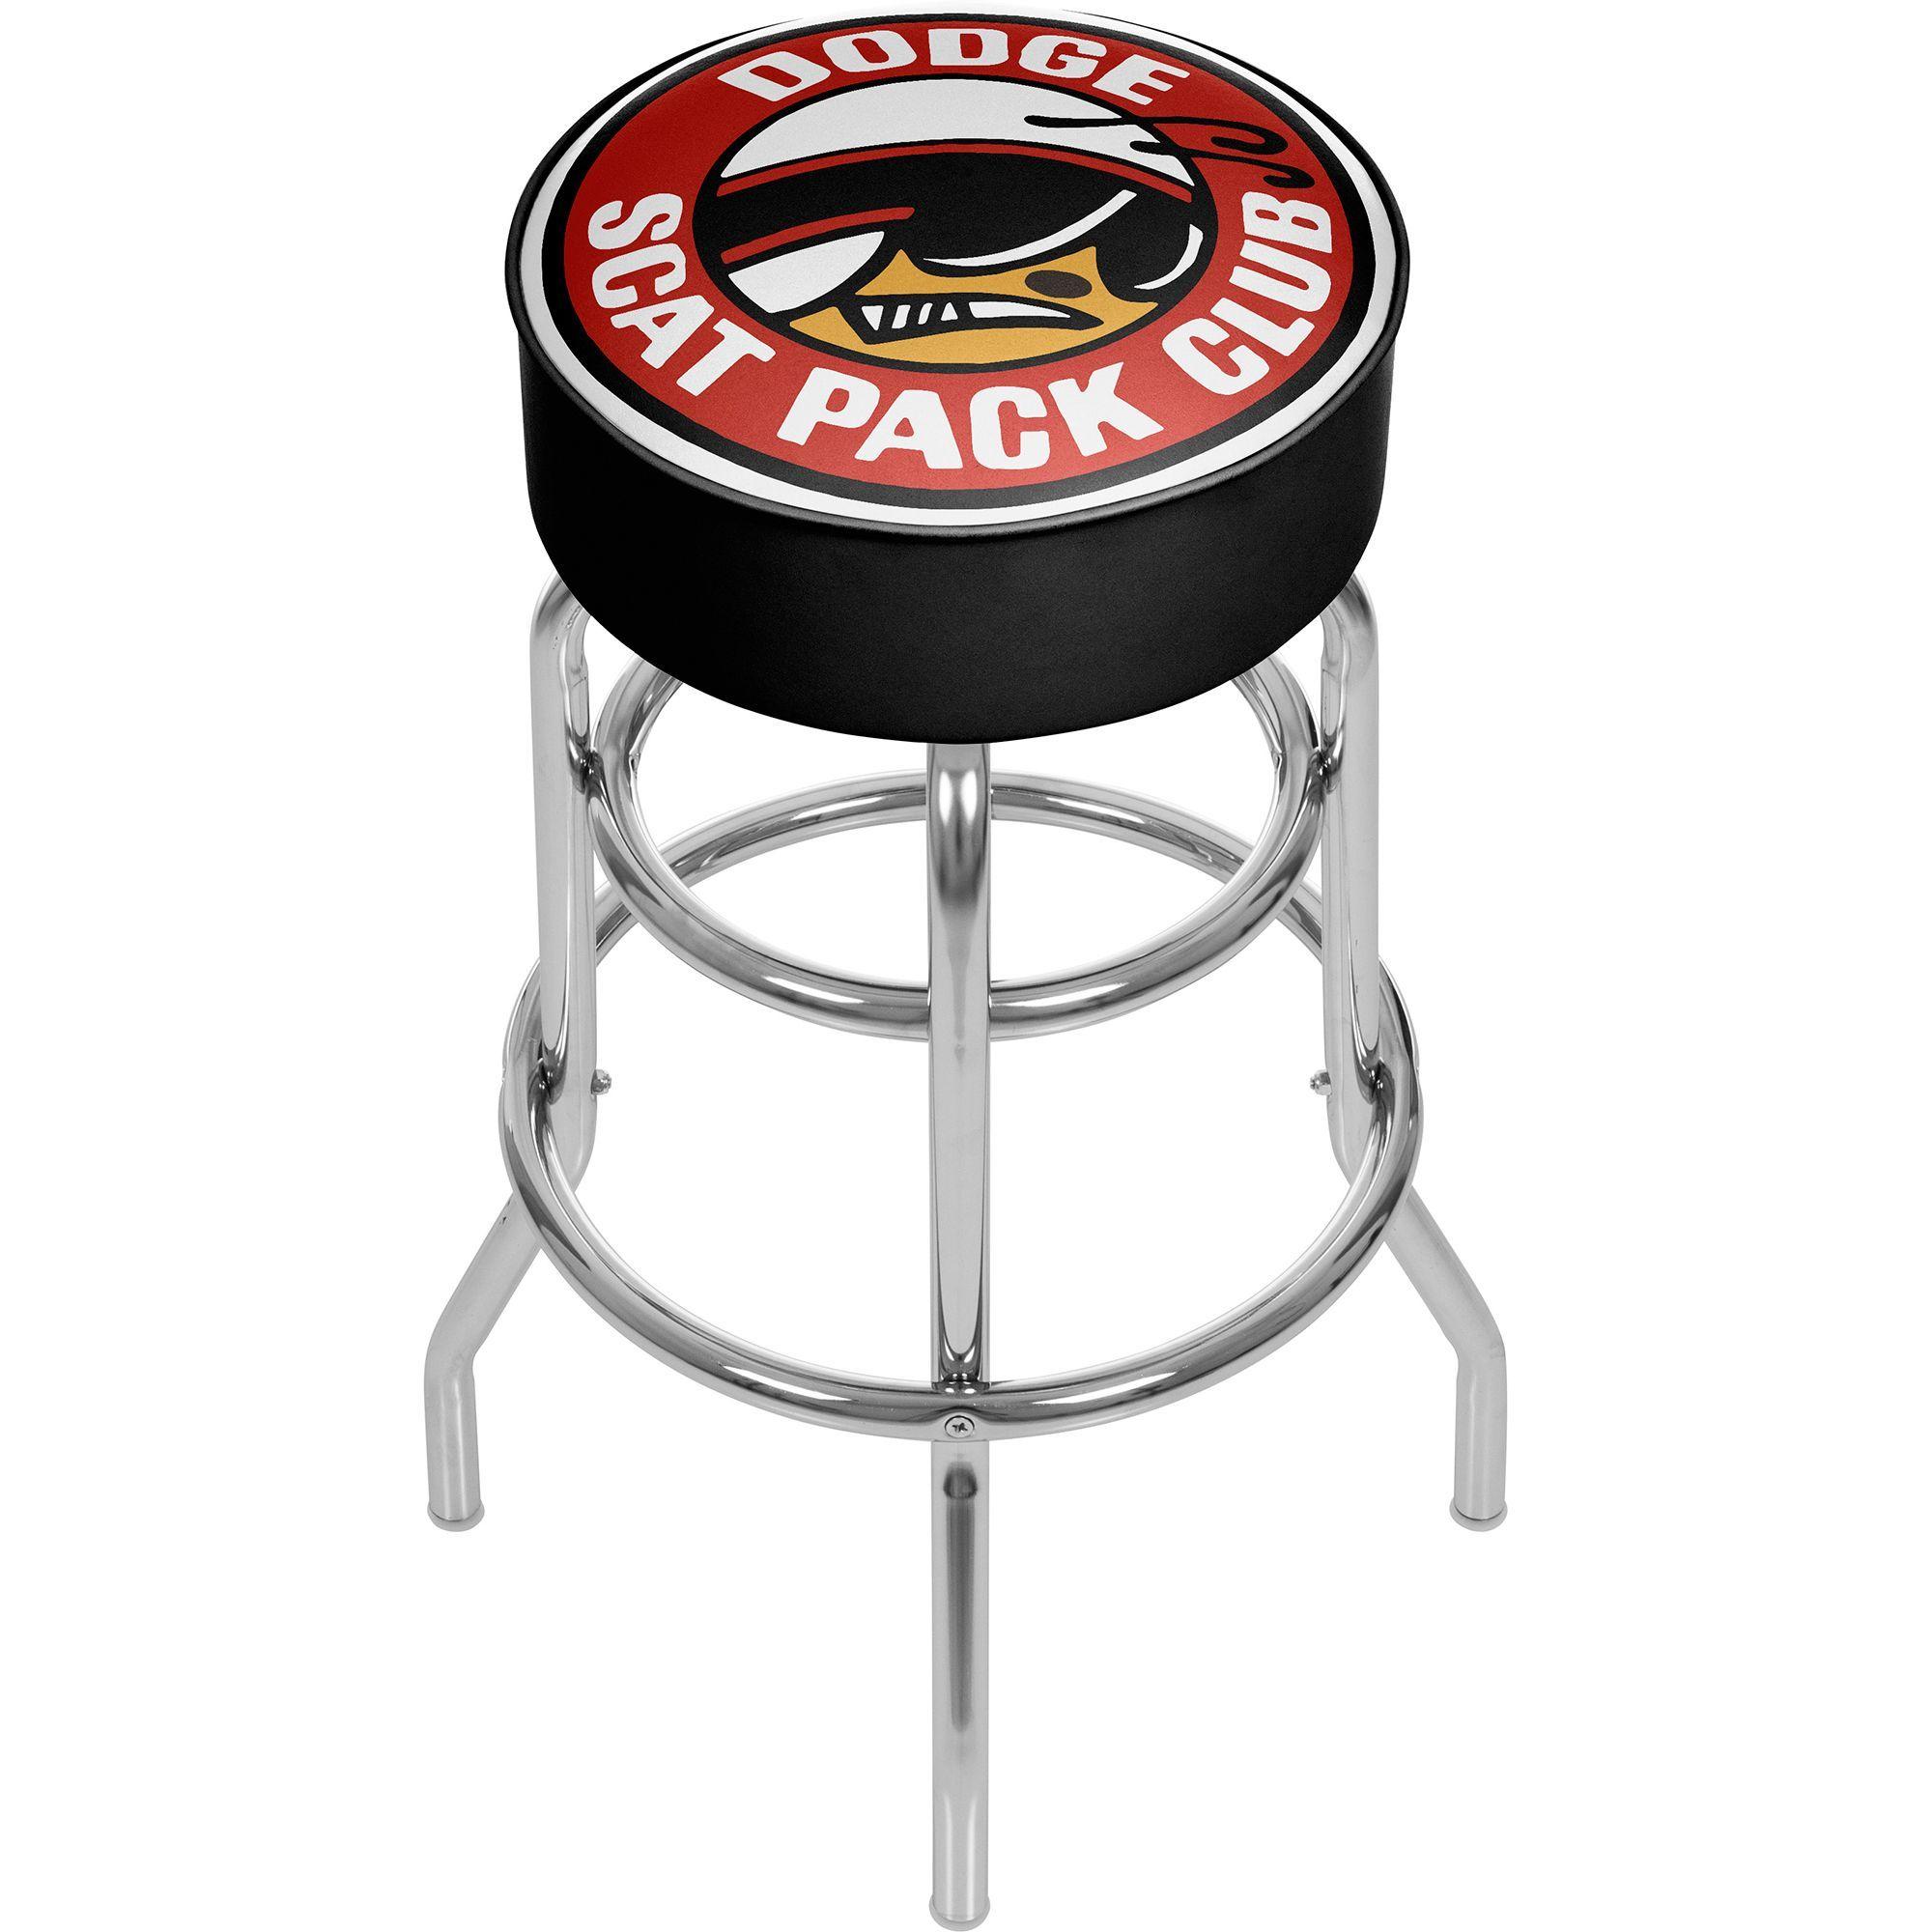 Trademark Dodge Bar Stool - Scat Pack Club